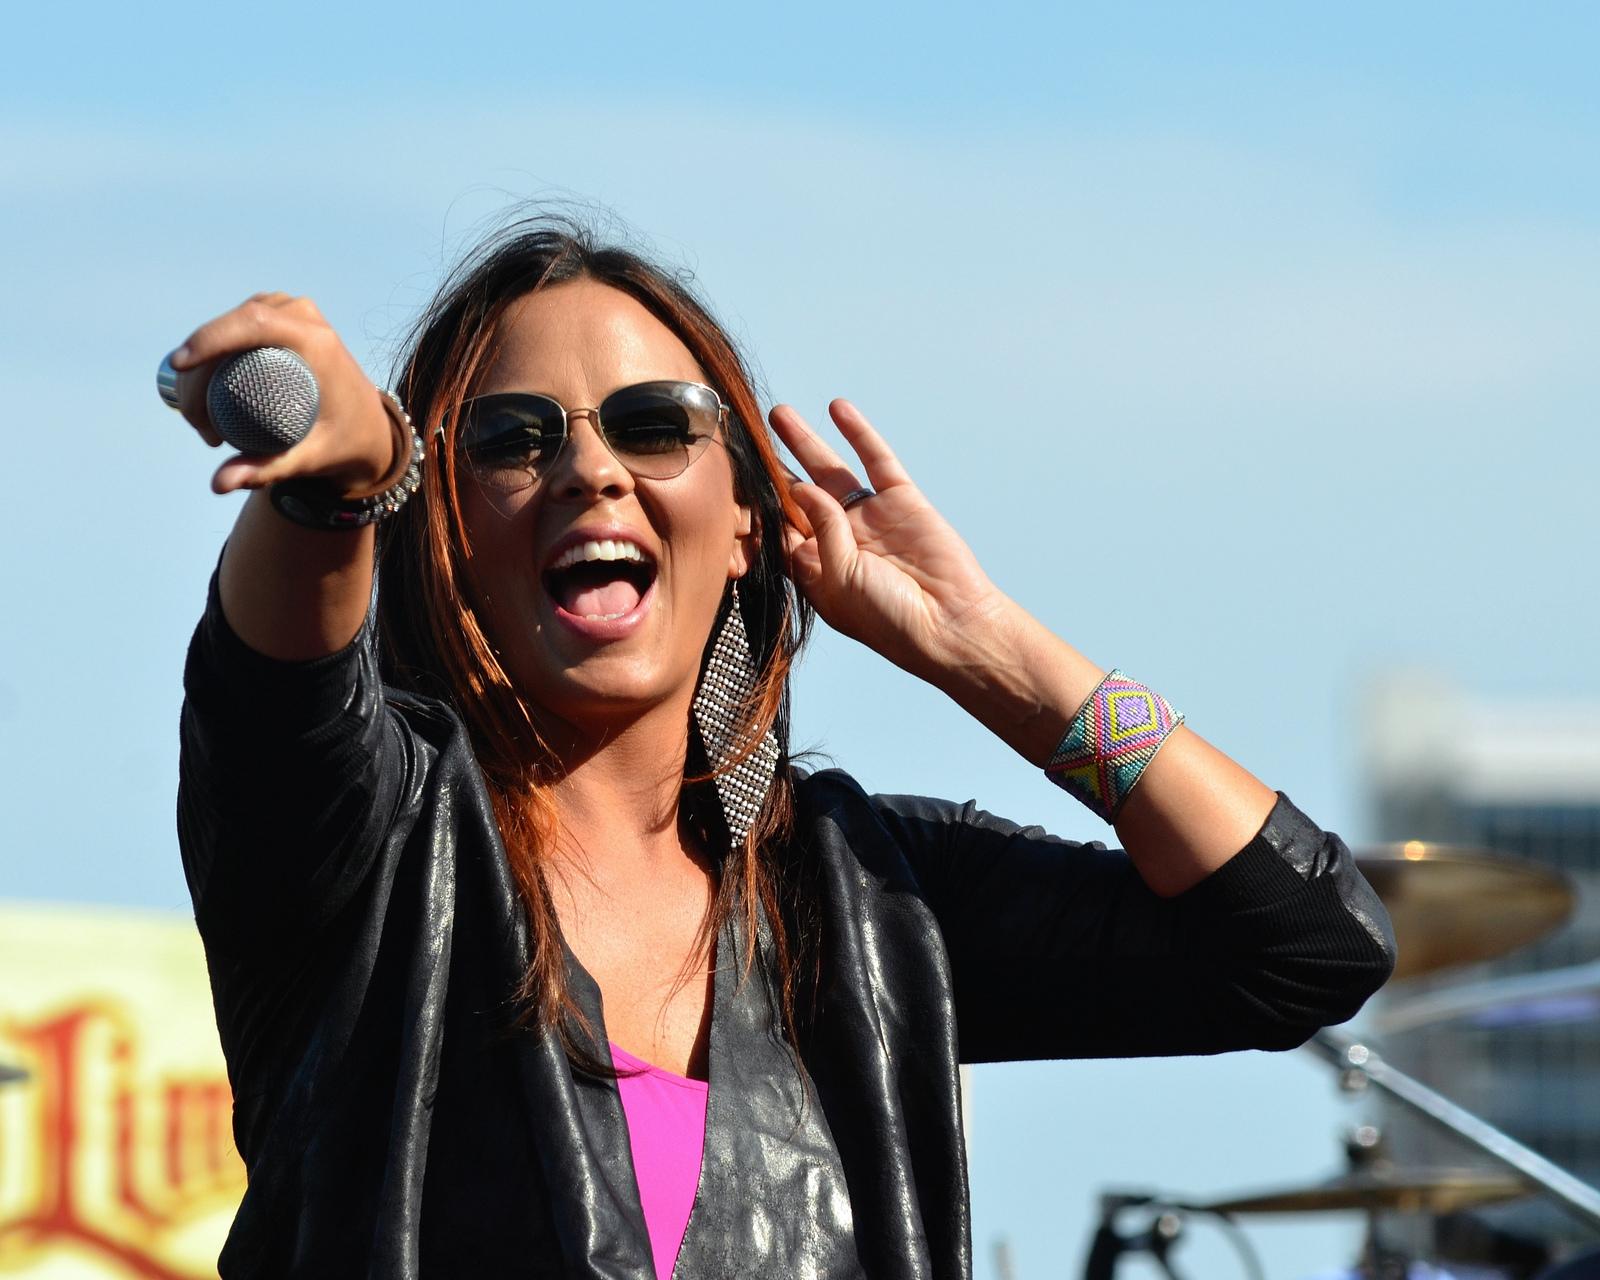 Sara Evans performing at the Texas Motor Speedway